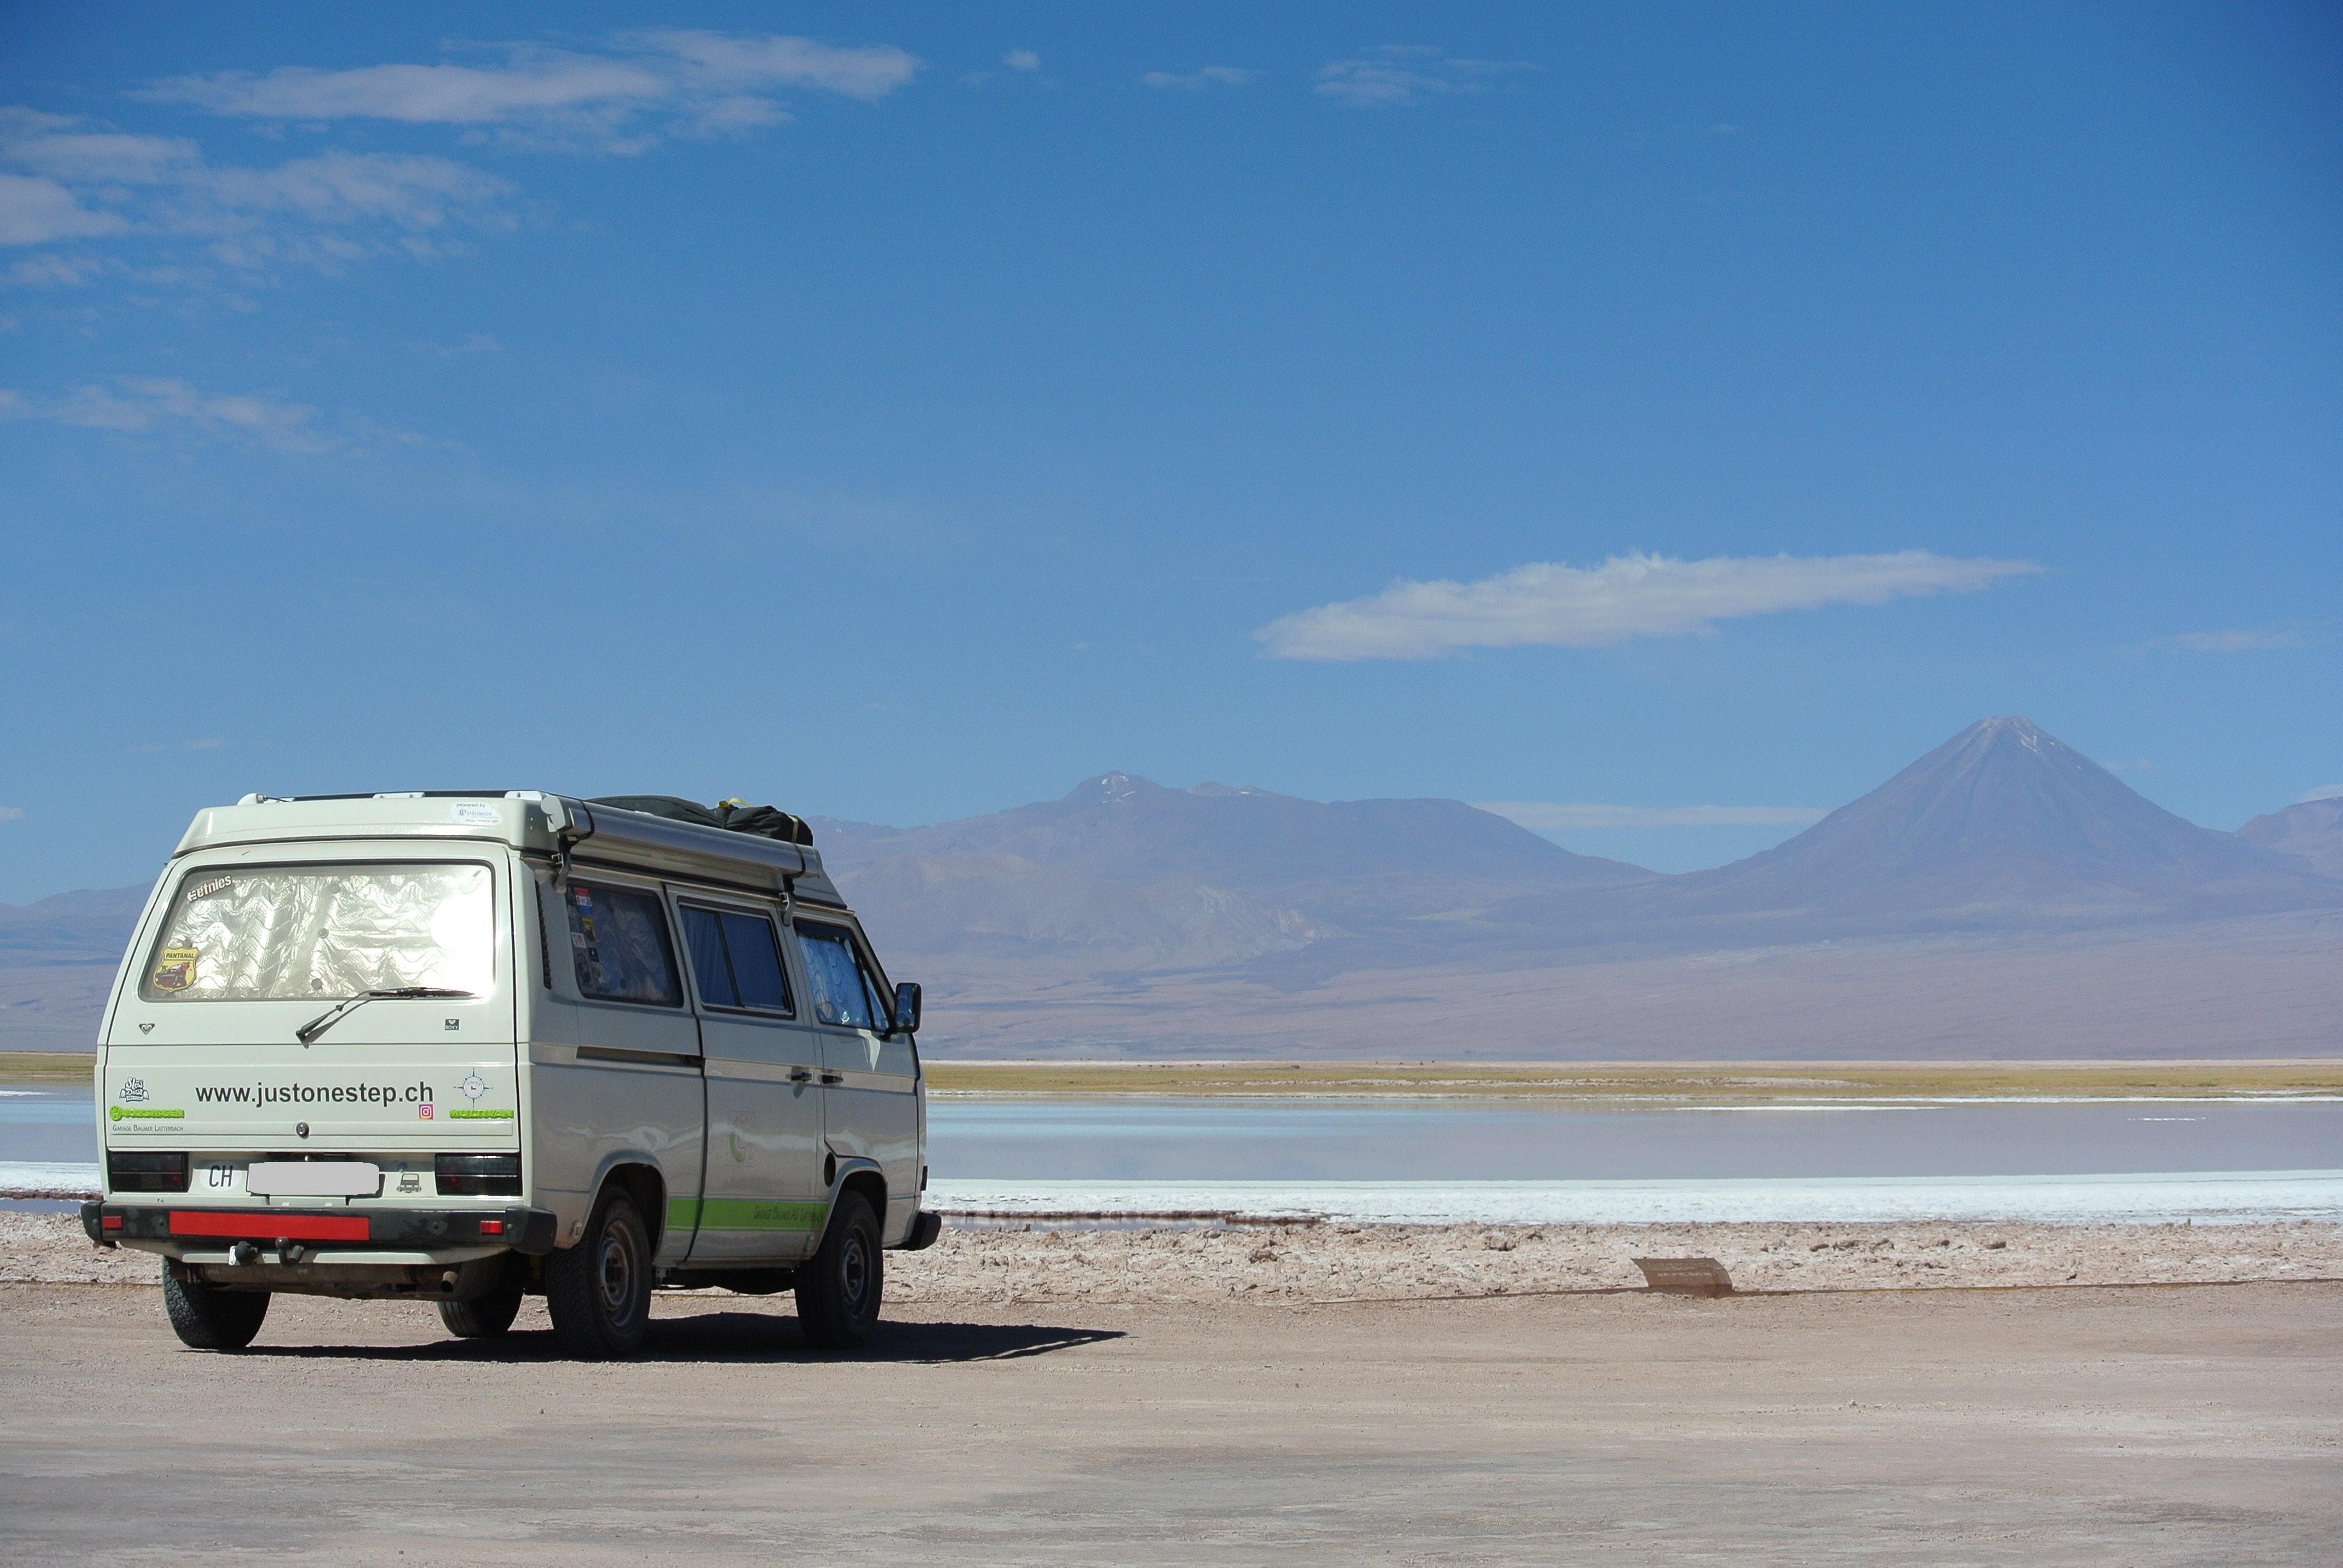 032 0912 Mirador - Salar de Atacama 176jpeg